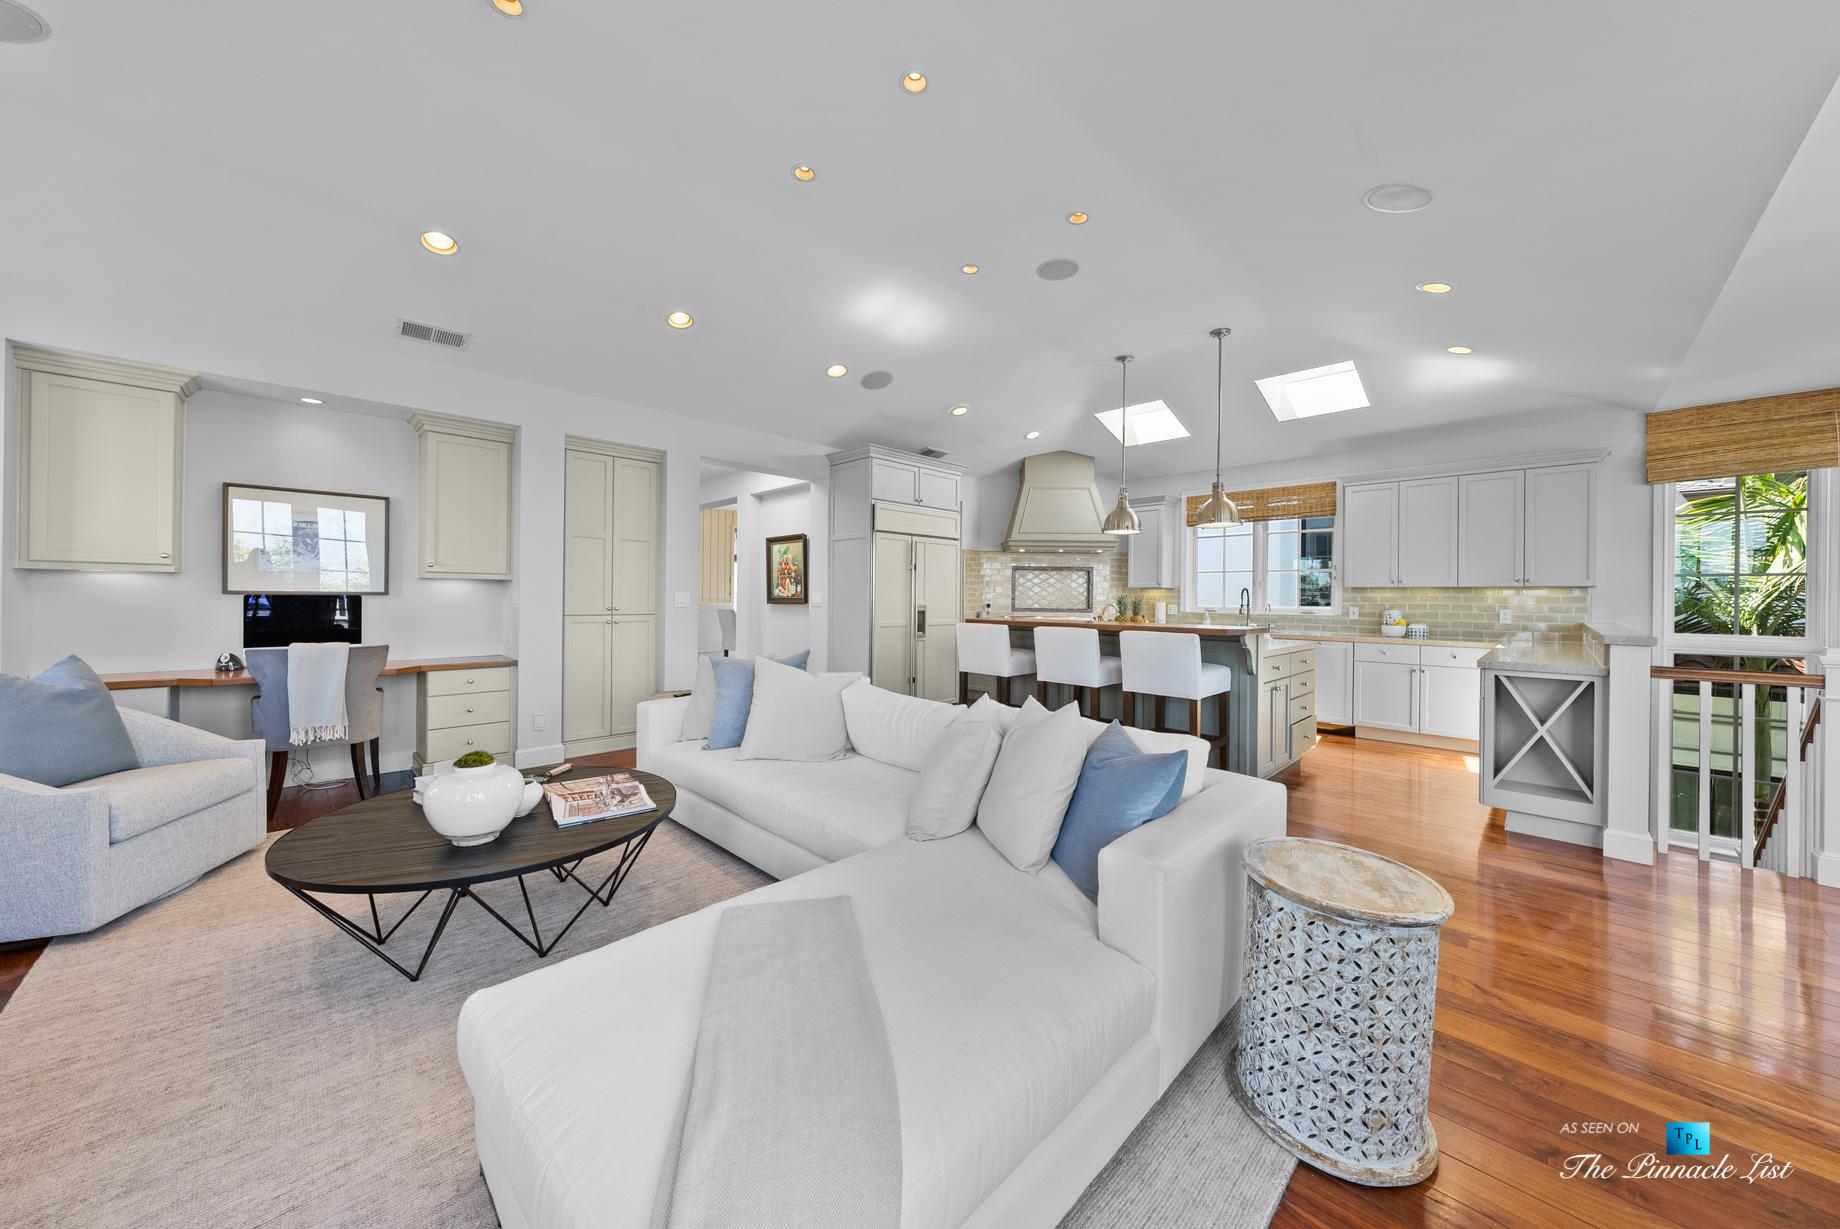 877 8th Street, Manhattan Beach, CA, USA – Living Room and Kitchen